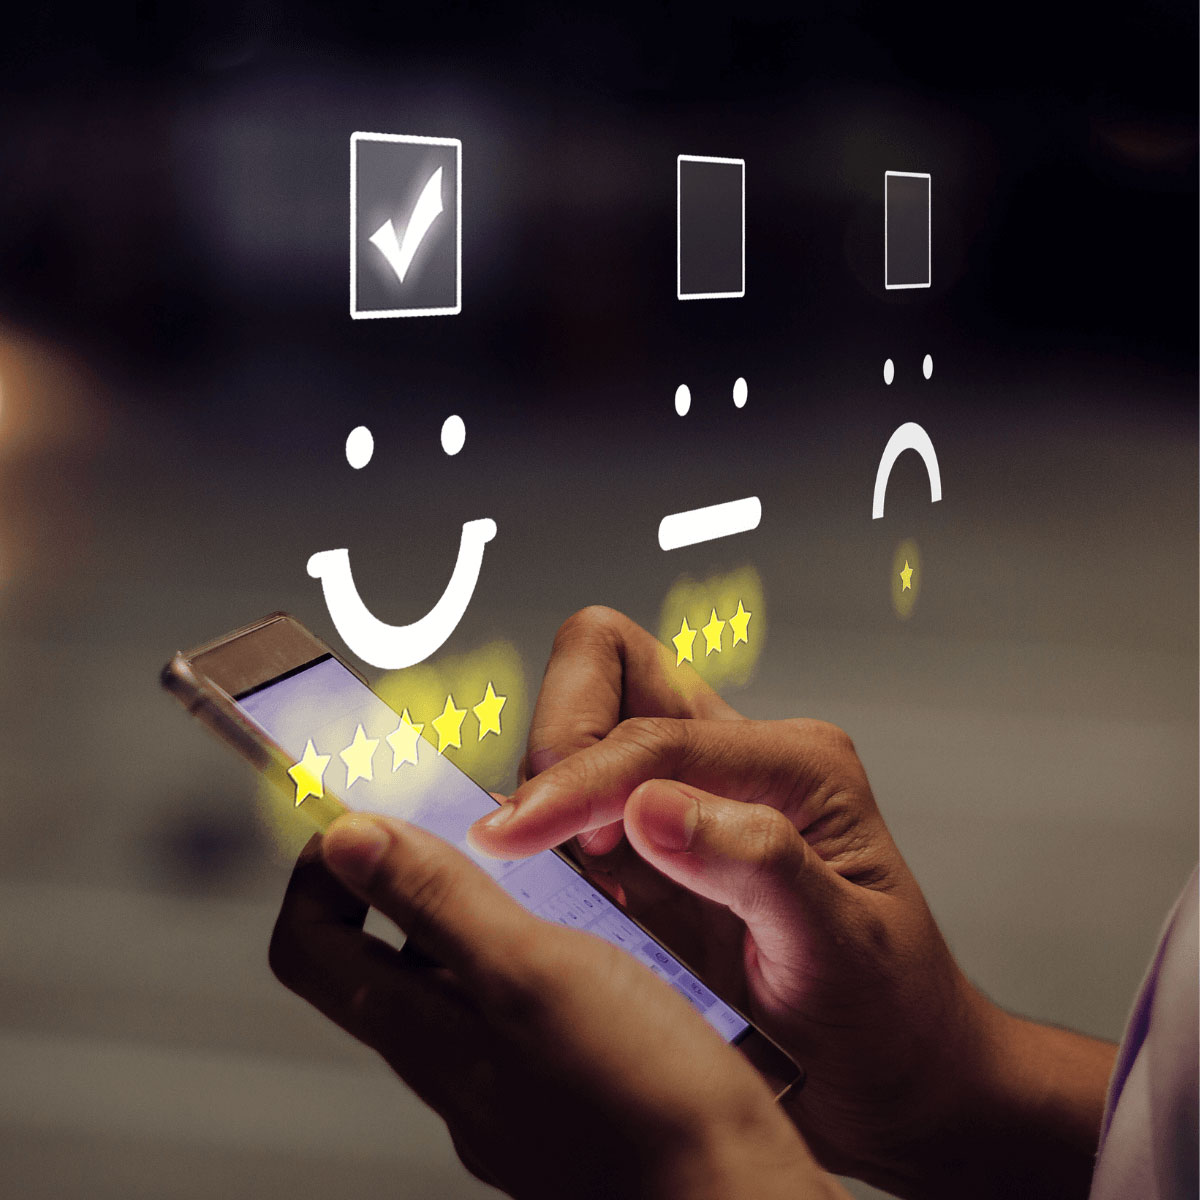 5 star customer service rating image